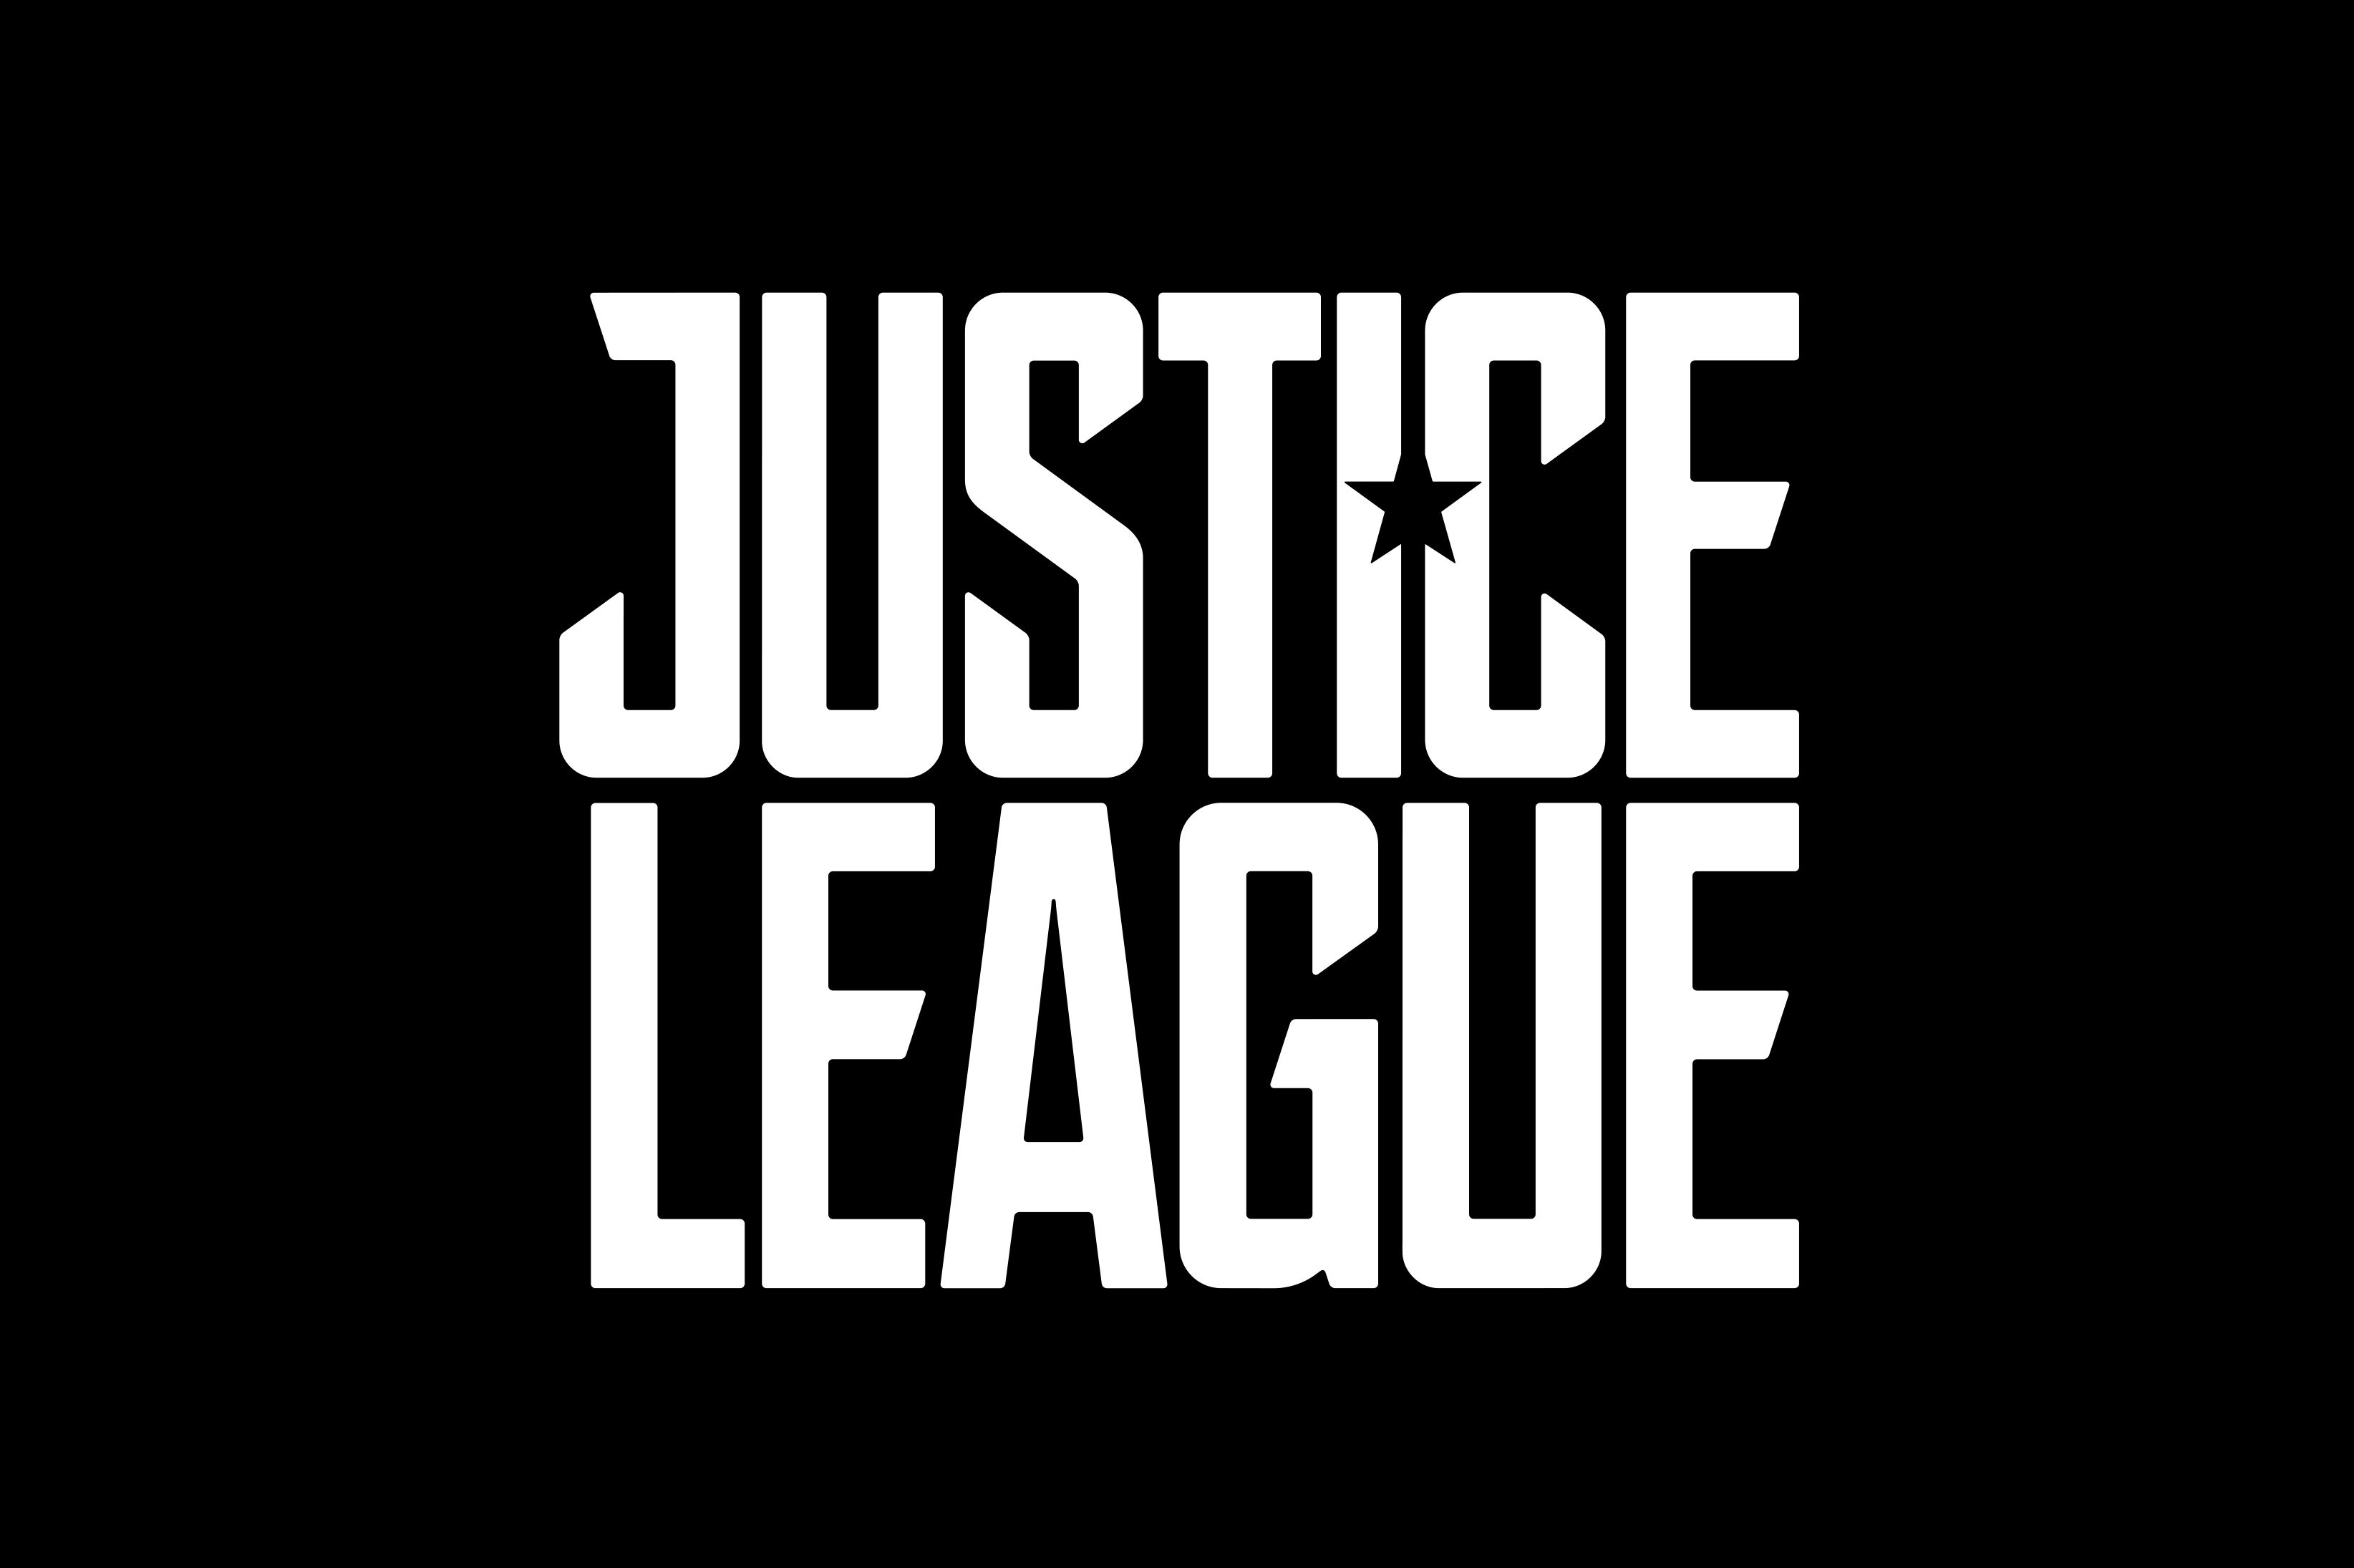 http://leakynews.s3.amazonaws.com/pub/wp-content/uploads/2016/06/Justice-League-Movie-Logo-Black-BG.jpg